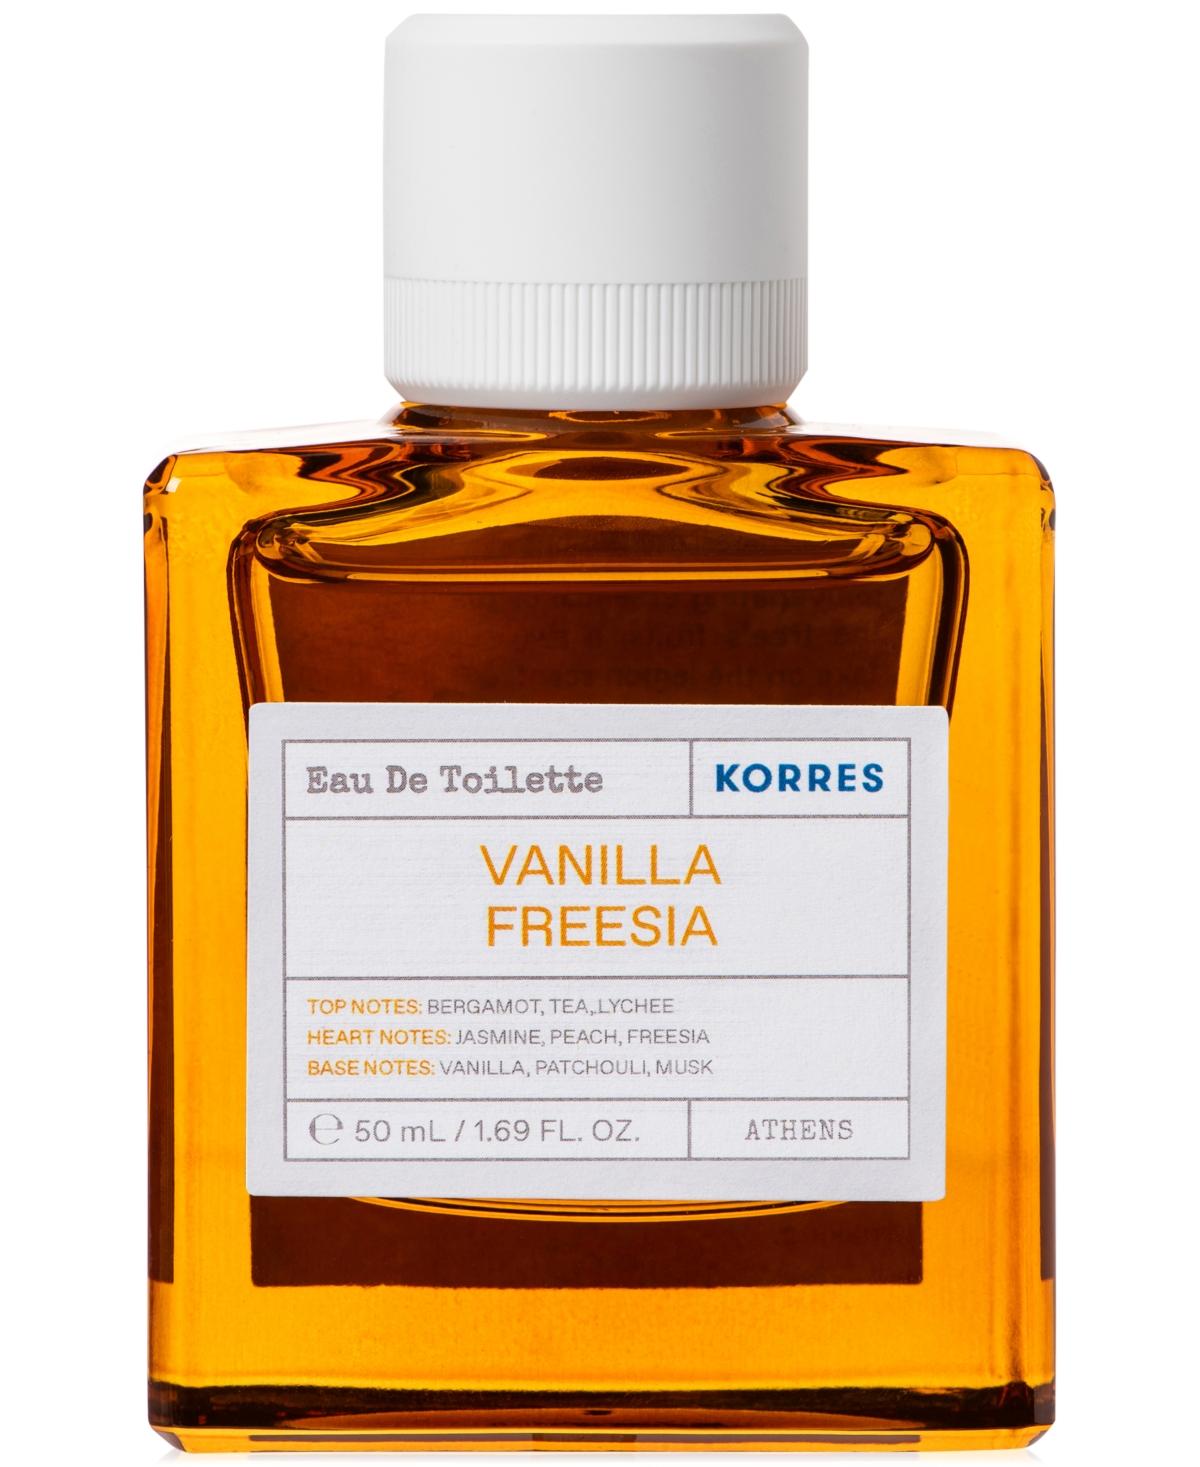 Korres Vanilla Freesia Eau de Toilette, 1.69-oz.